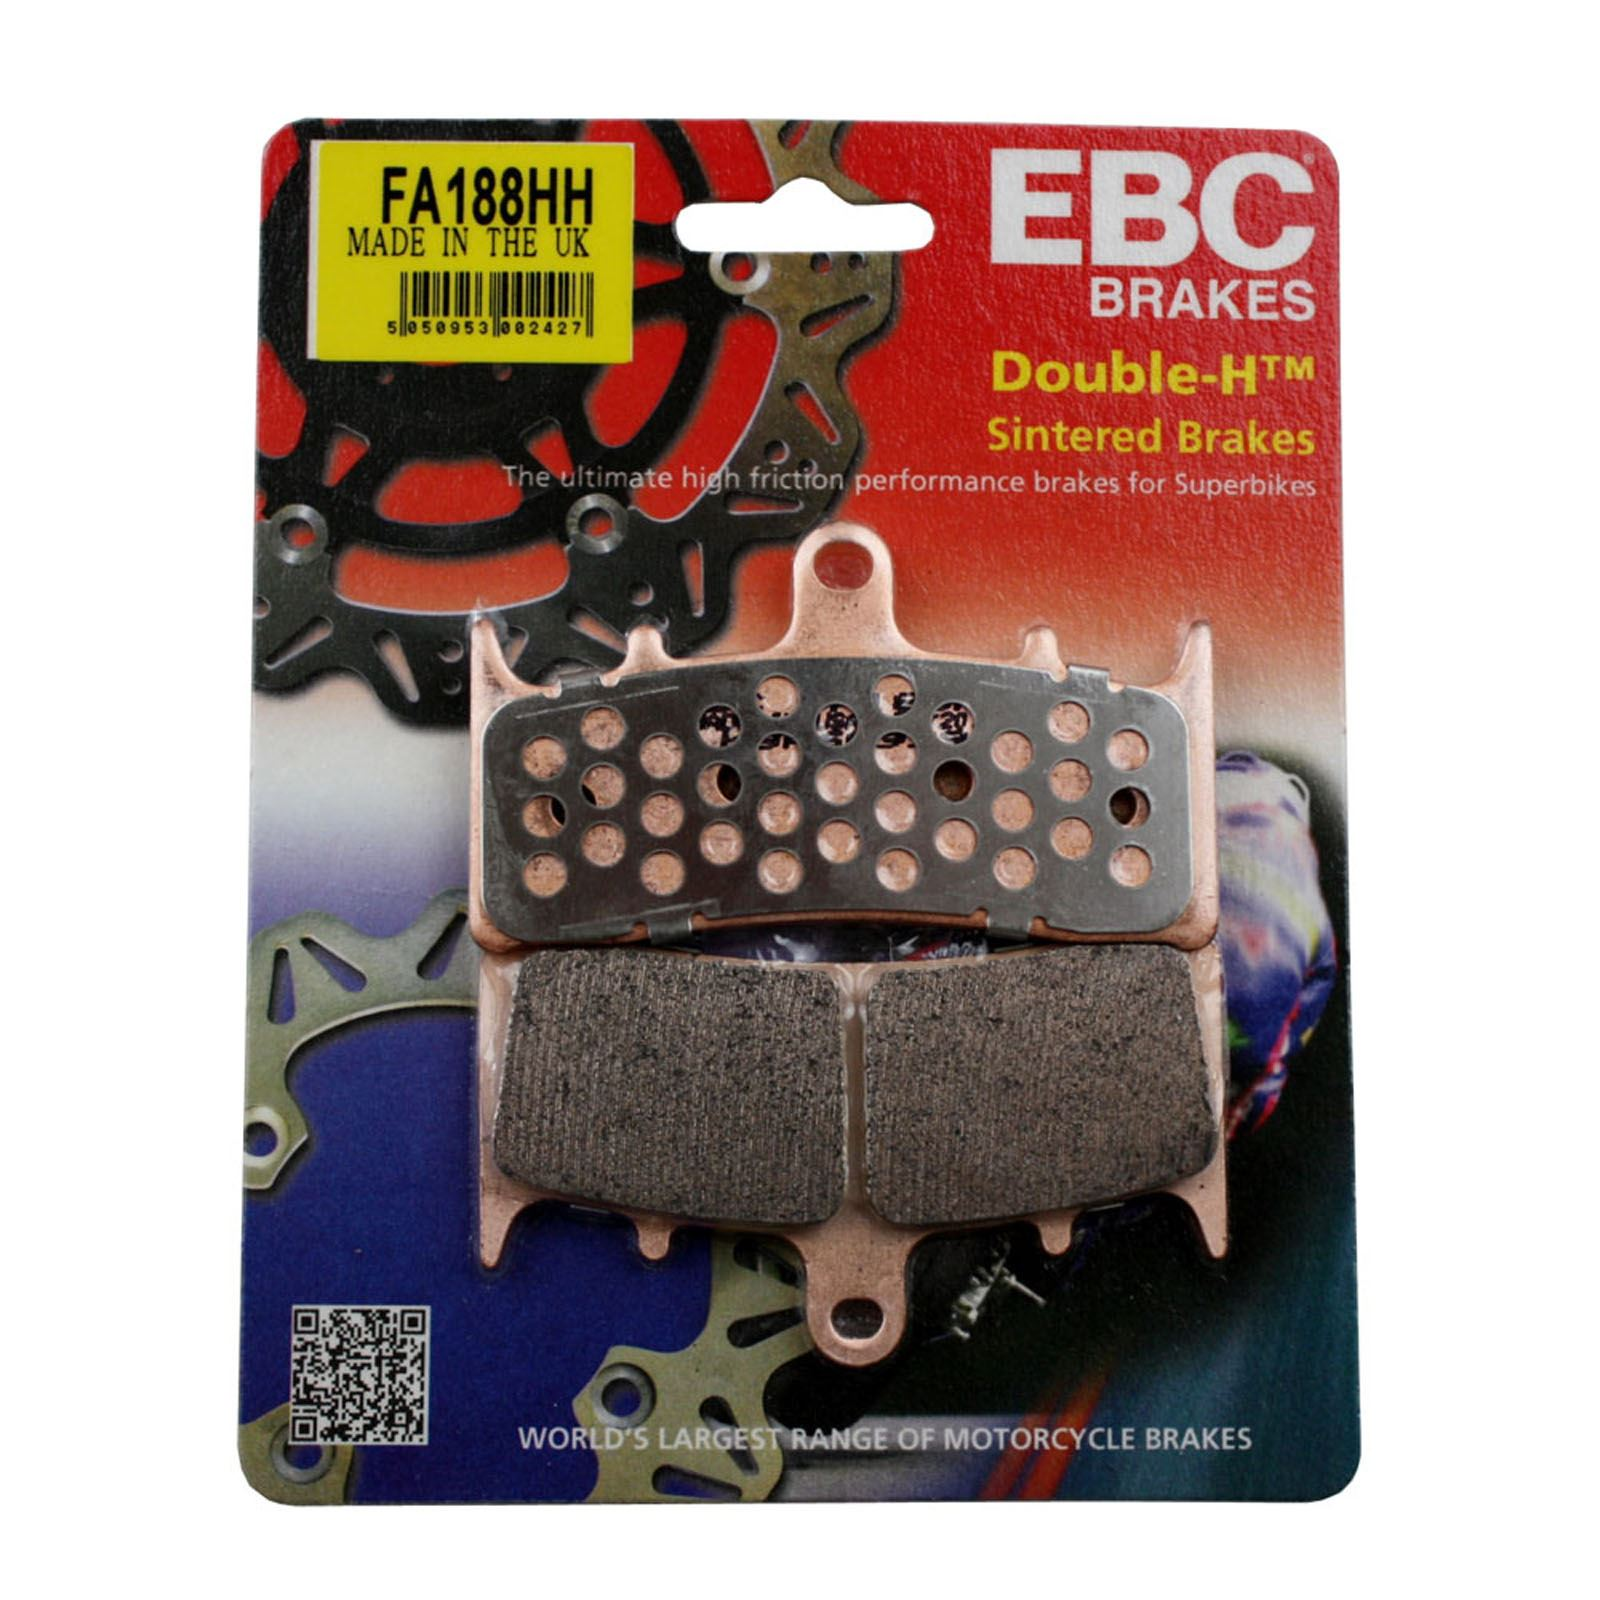 EBC Double-H Sintered Brake Pads FA188HH by EBC Brakes